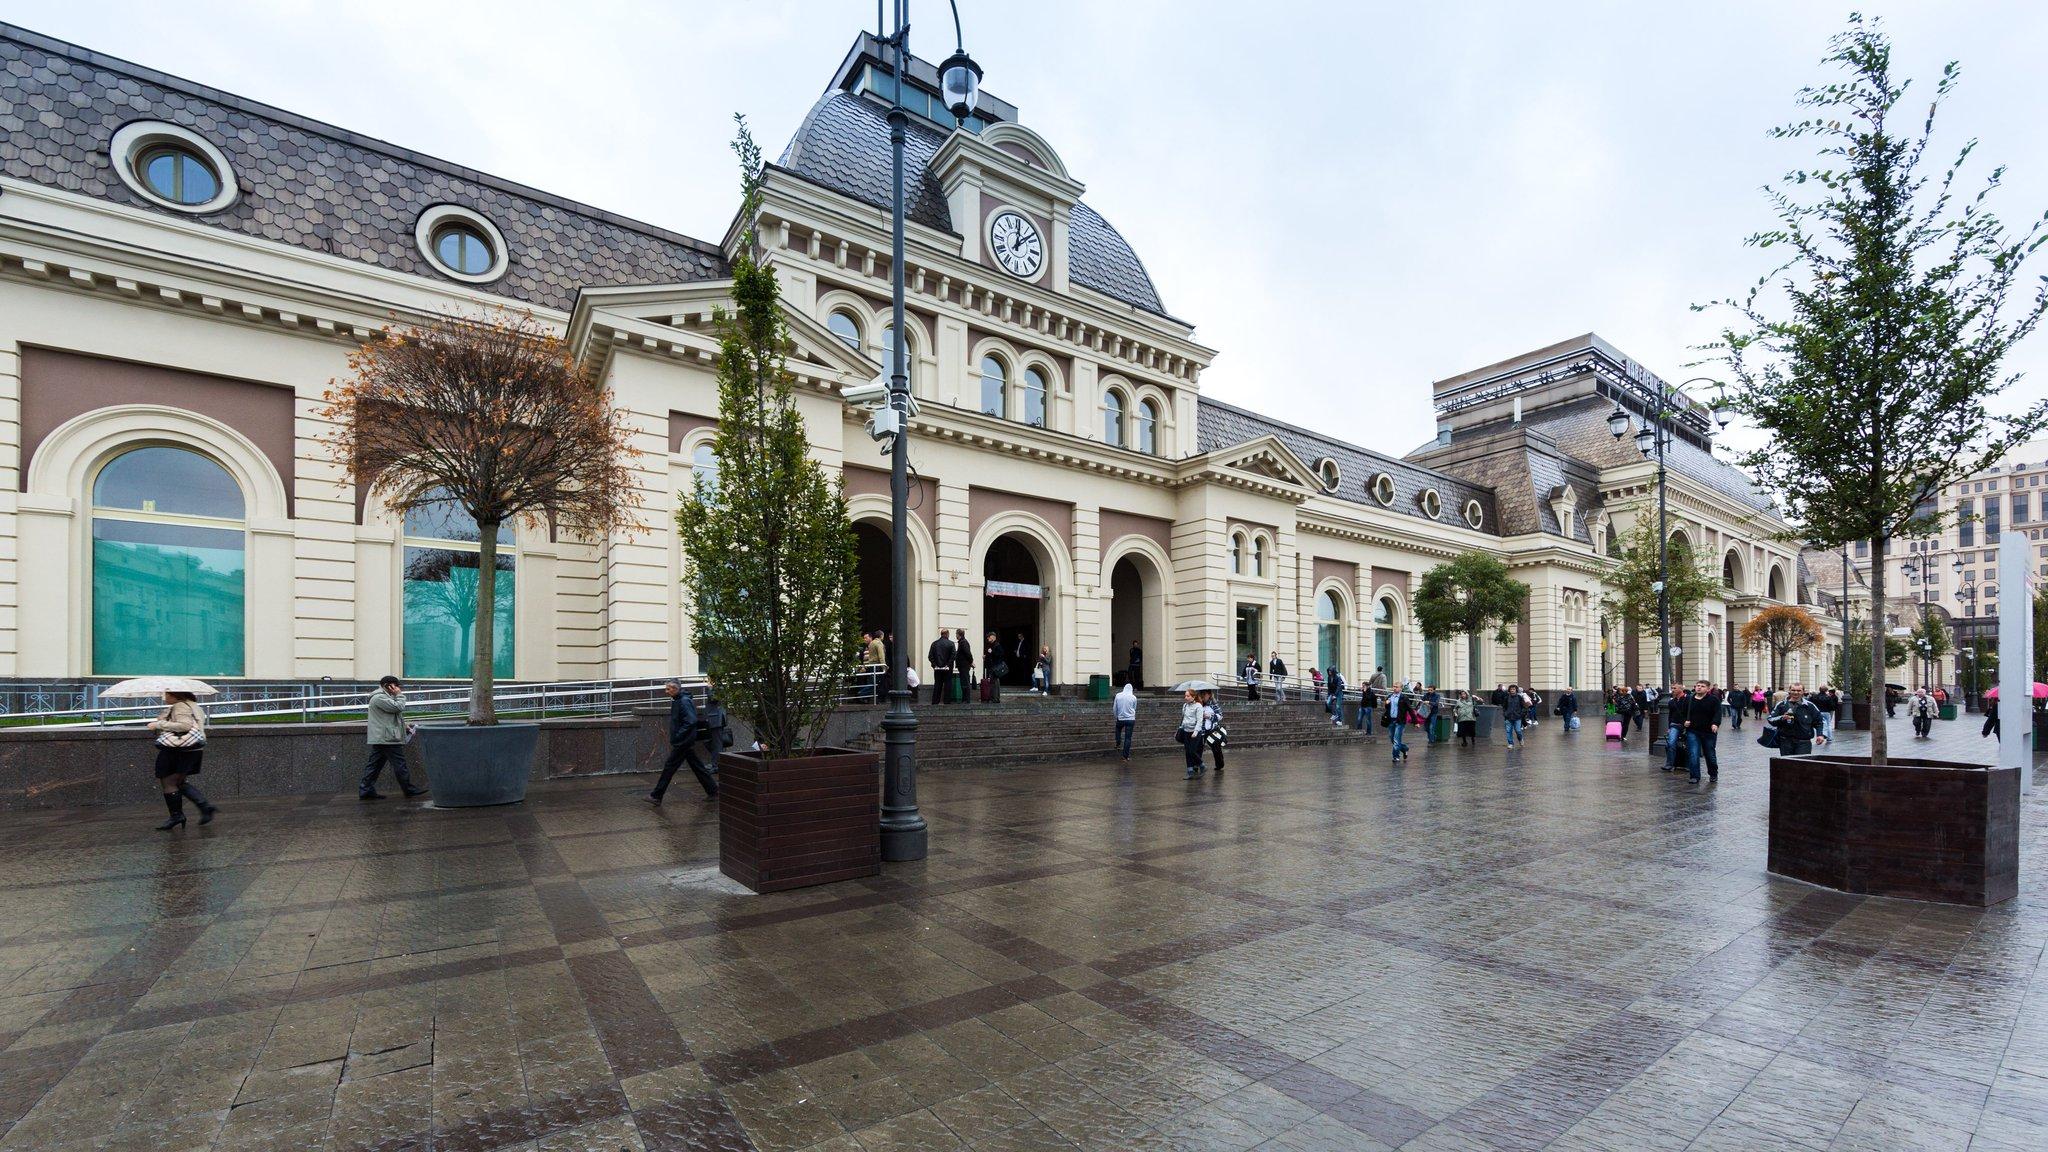 москва павелецкий вокзал фото нужно